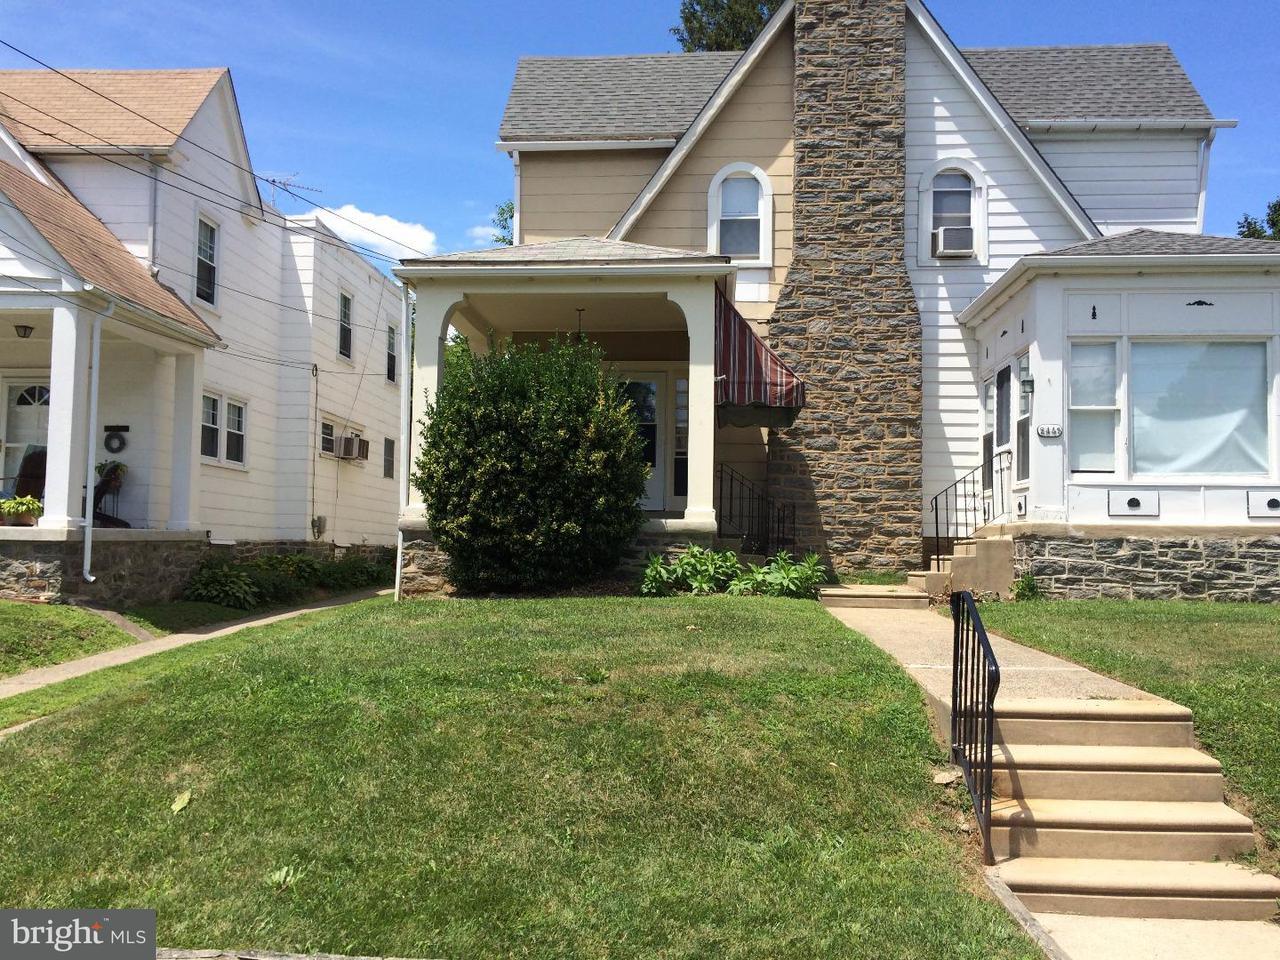 Casa unifamiliar adosada (Townhouse) por un Alquiler en 2447 ELDON Avenue Drexel Hill, Pennsylvania 19026 Estados Unidos